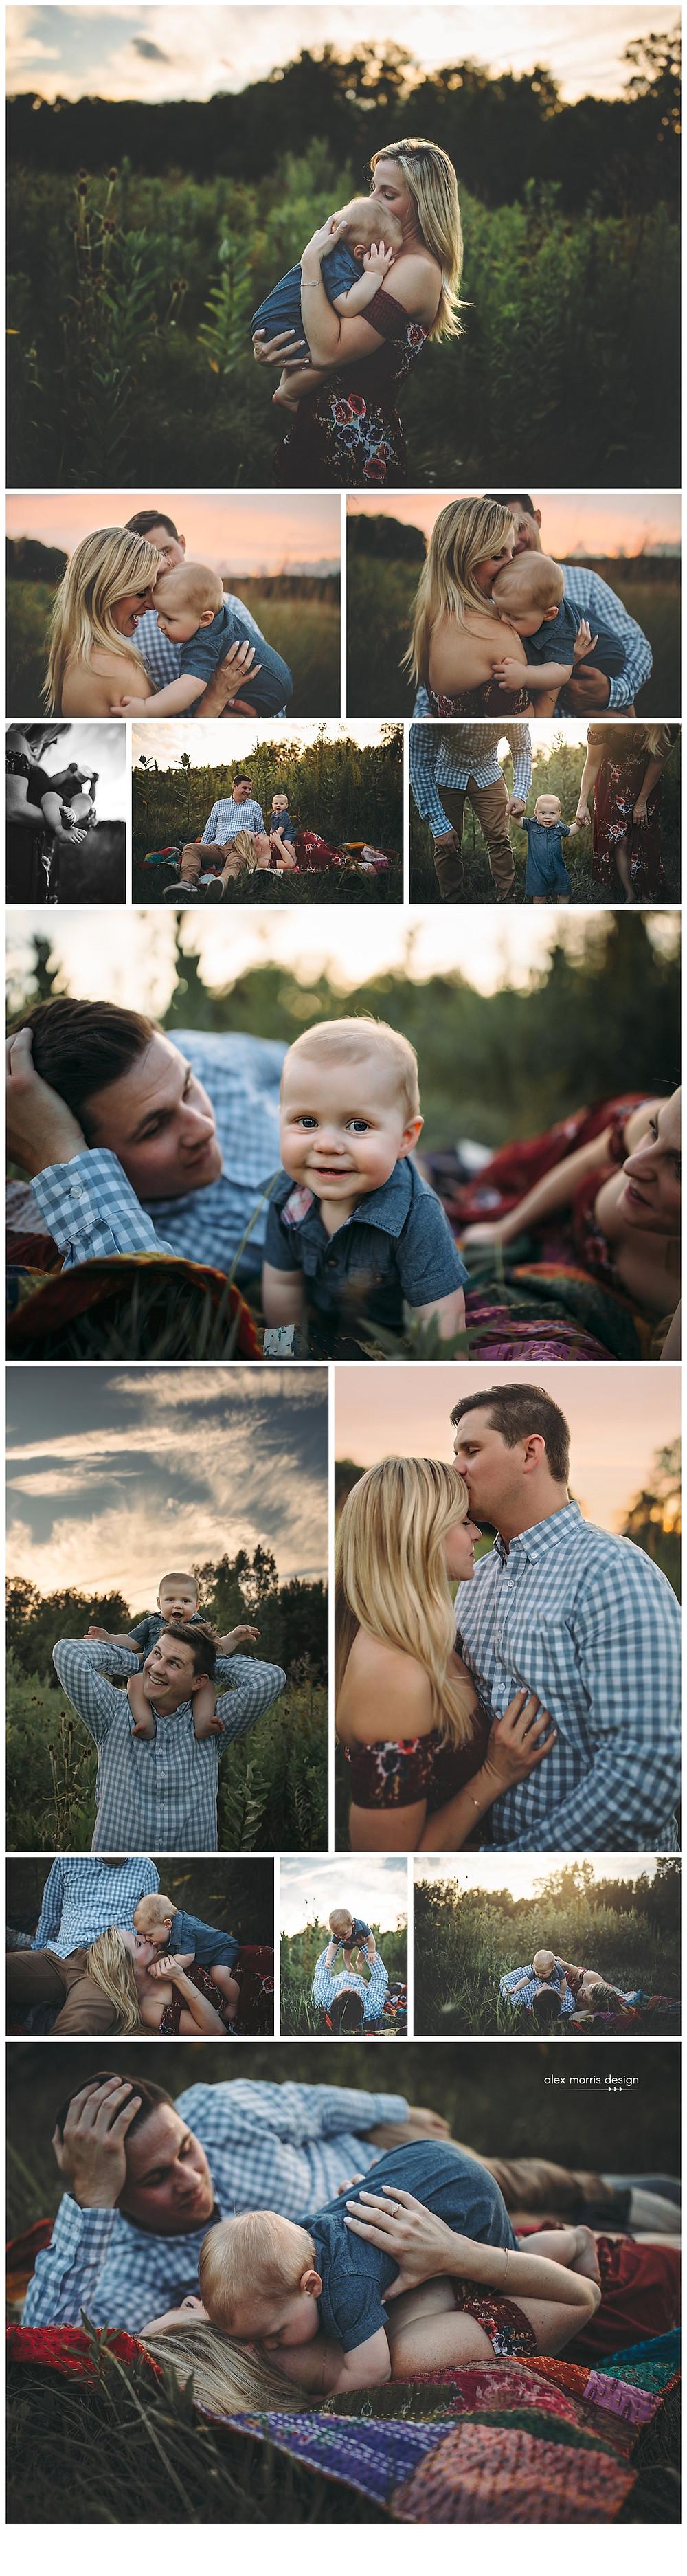 Indianapolis Family Photographer, Alex Morris Design